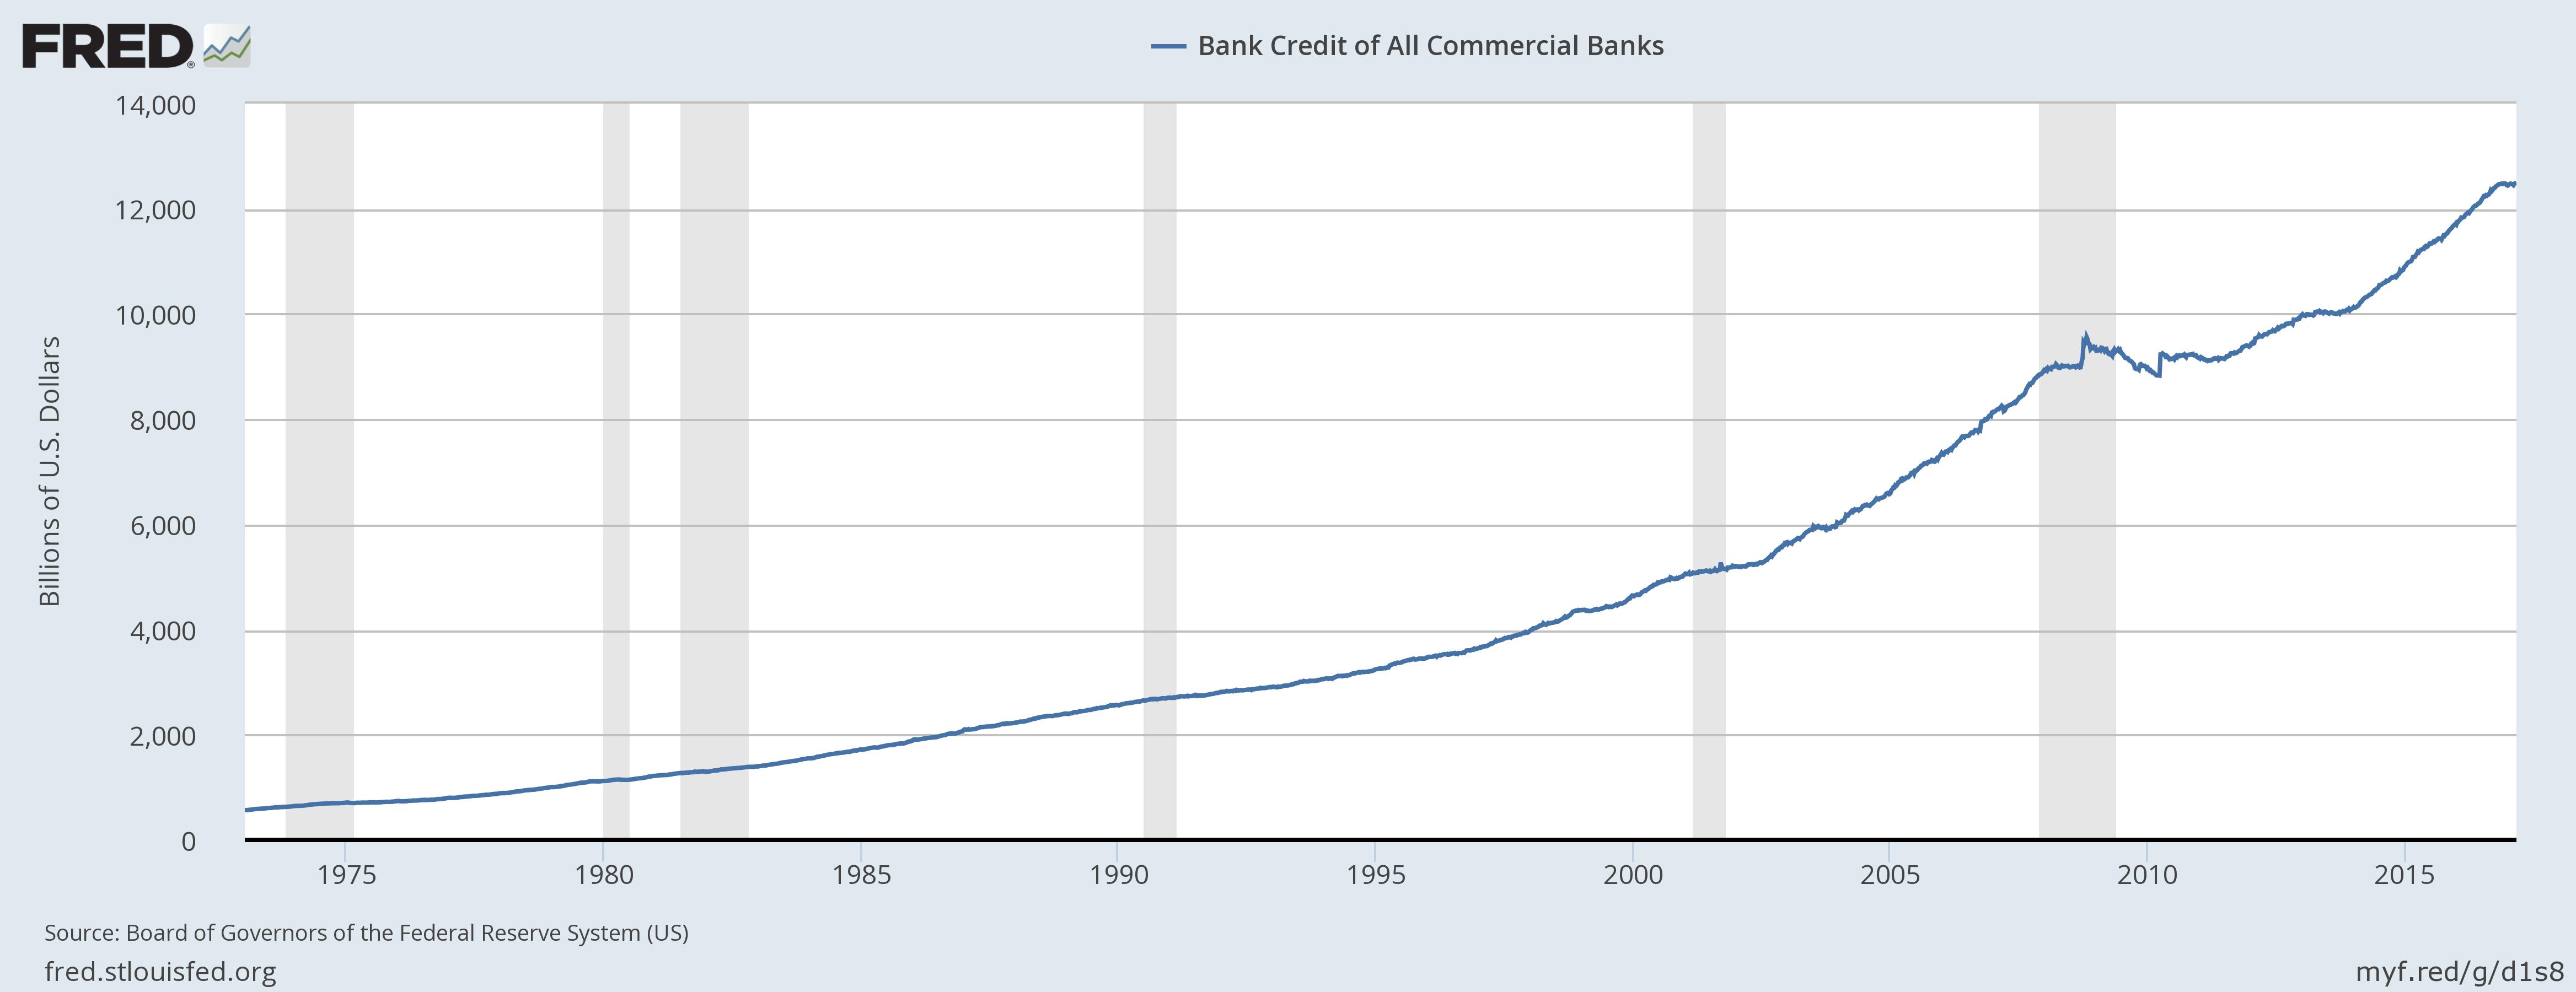 bank credit all commercial banks usa